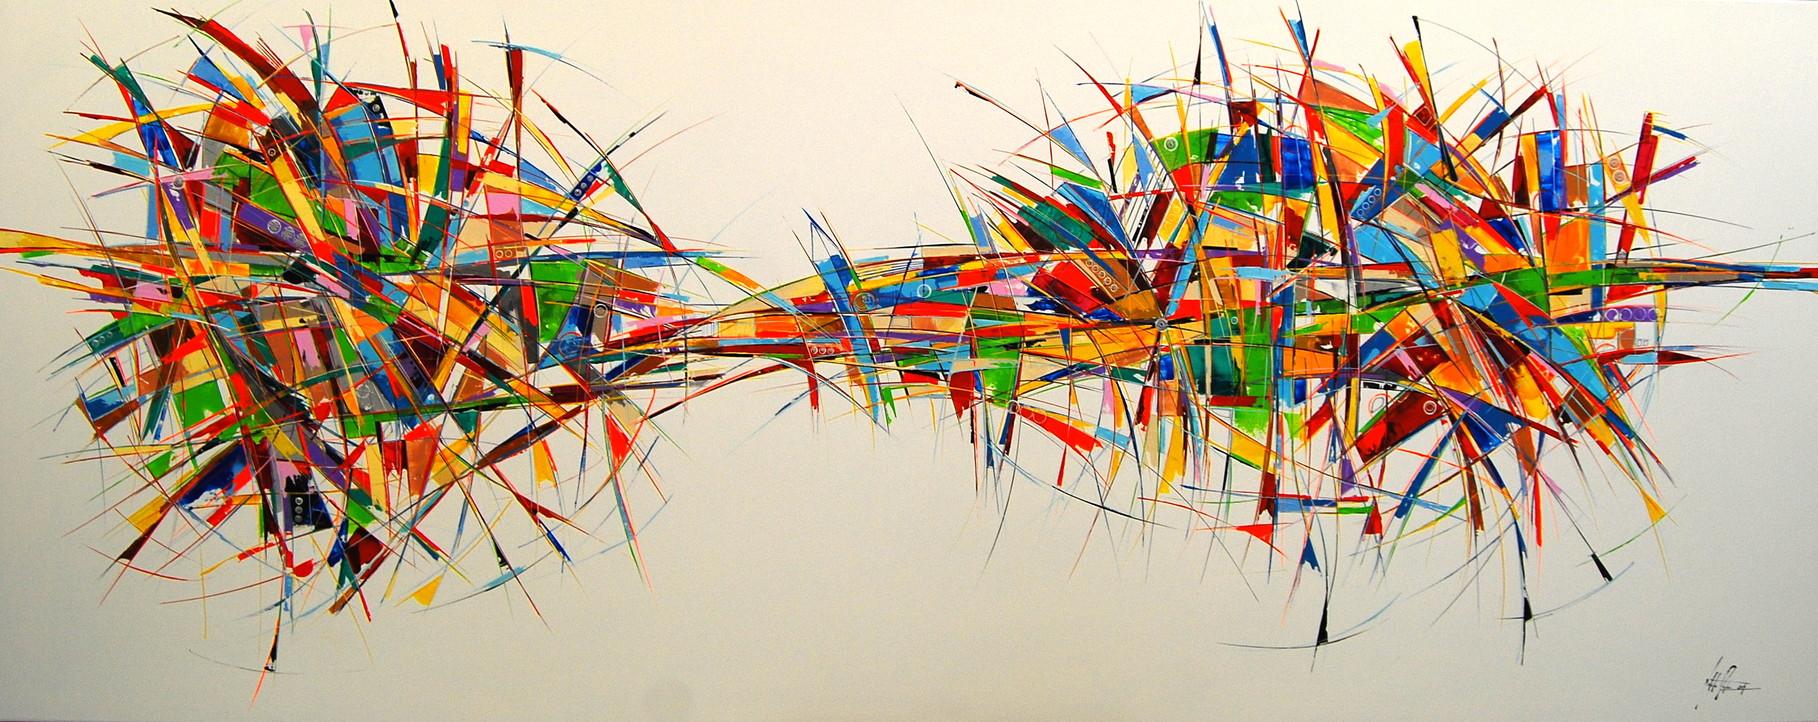 300 x 120 cm Acryl auf Leinwand, Galeriekeilrahmen.